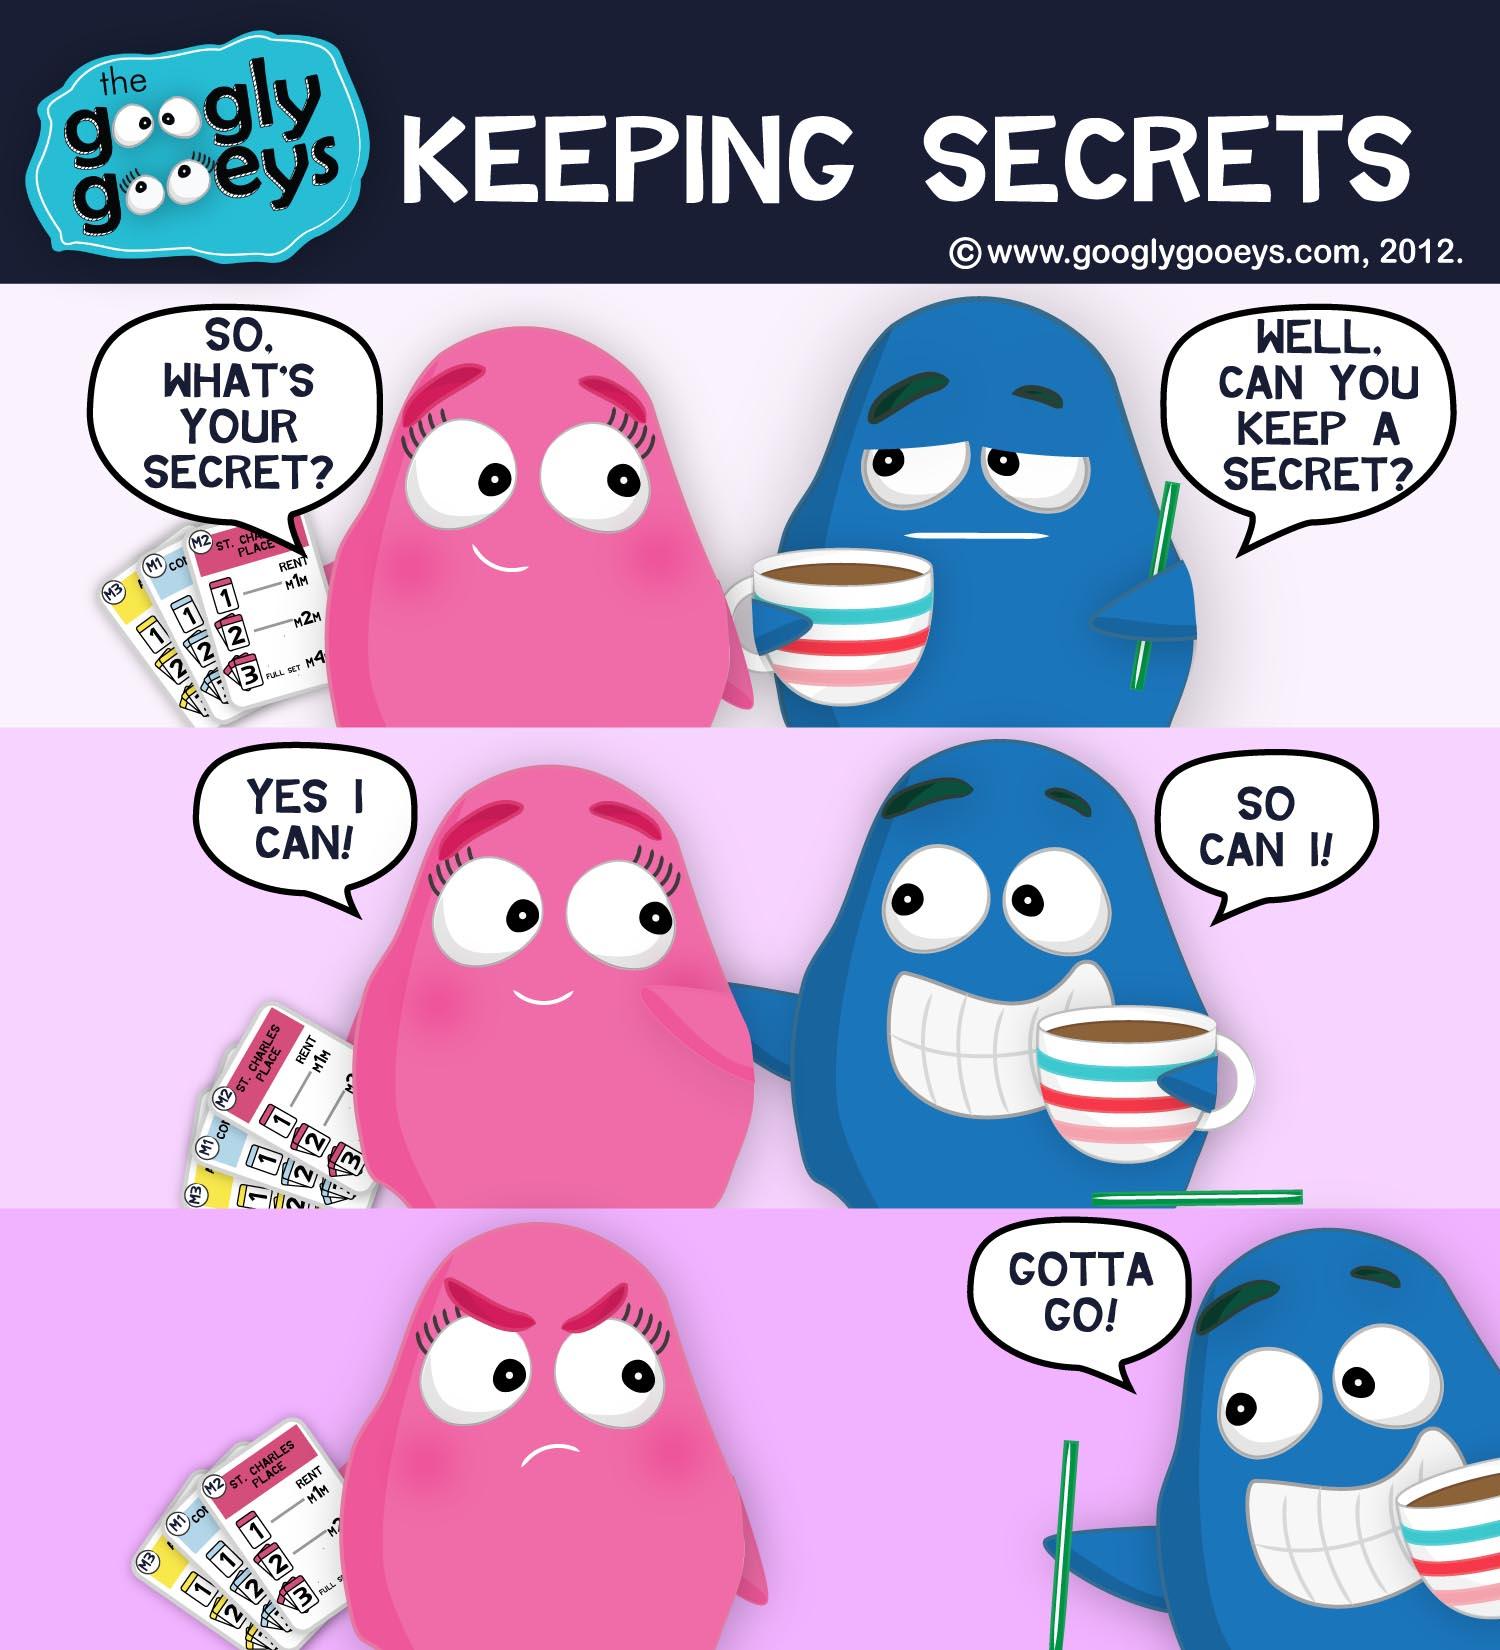 Googly Gooeys Keeping Secrets1